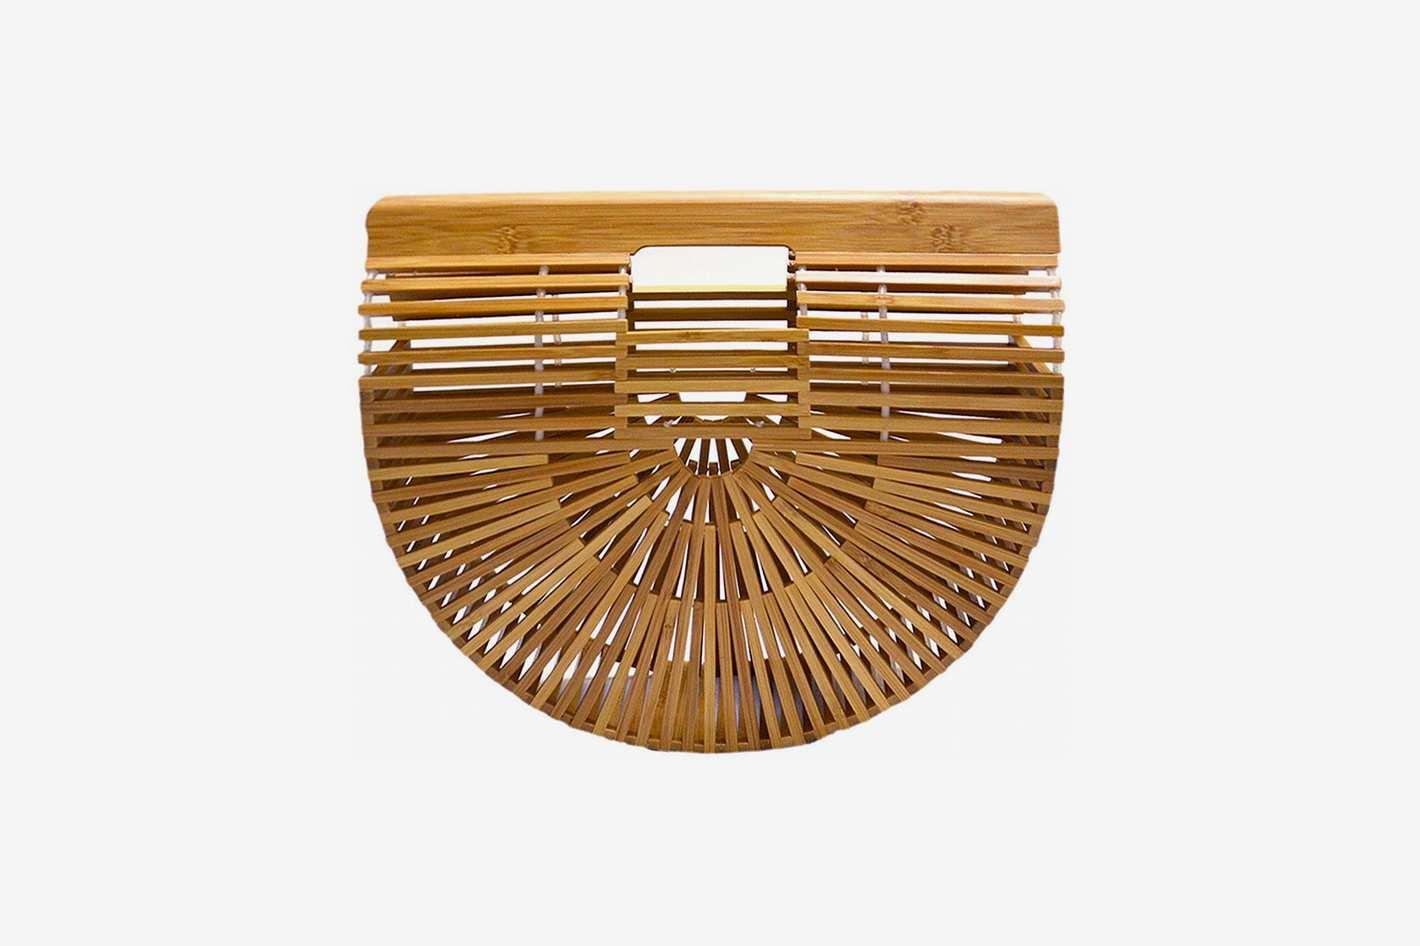 Miuco Womens Bamboo Handbag